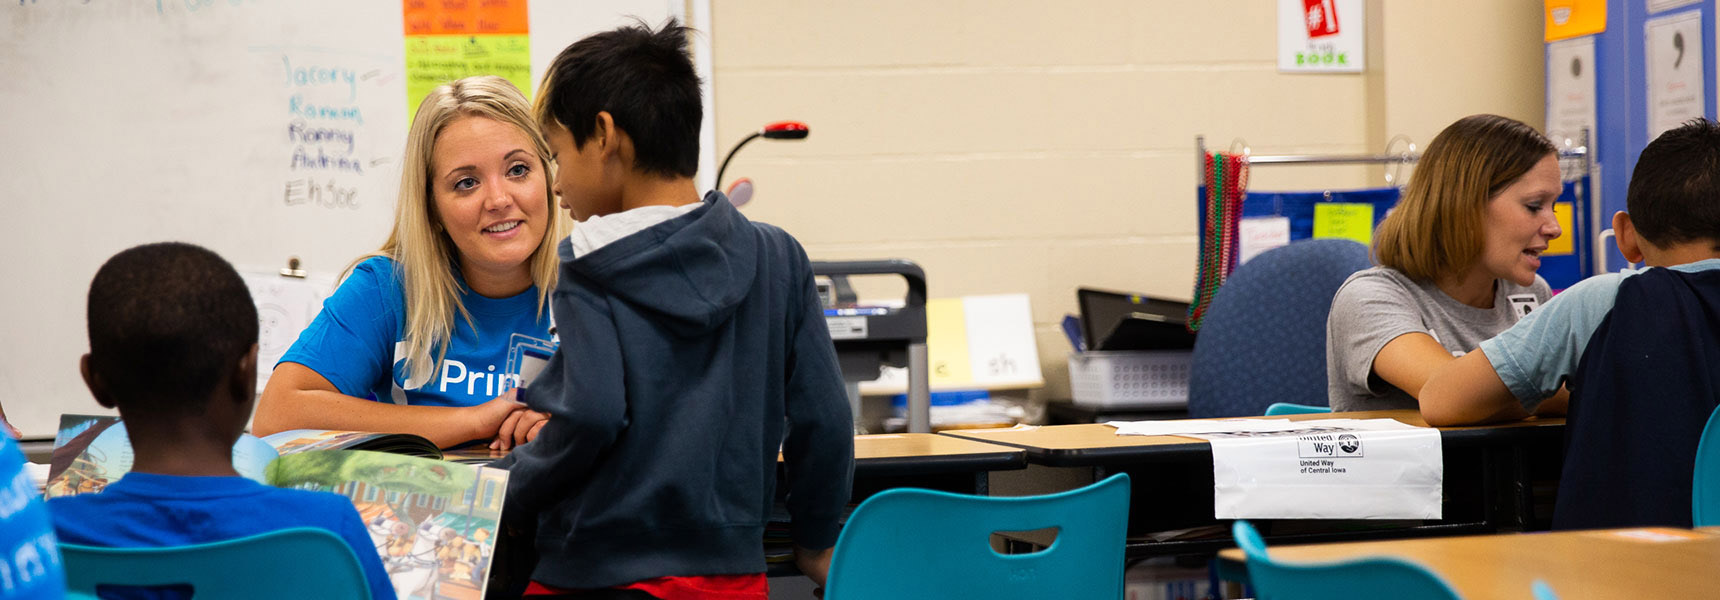 Photo of a Principal employee volunteering in a school.